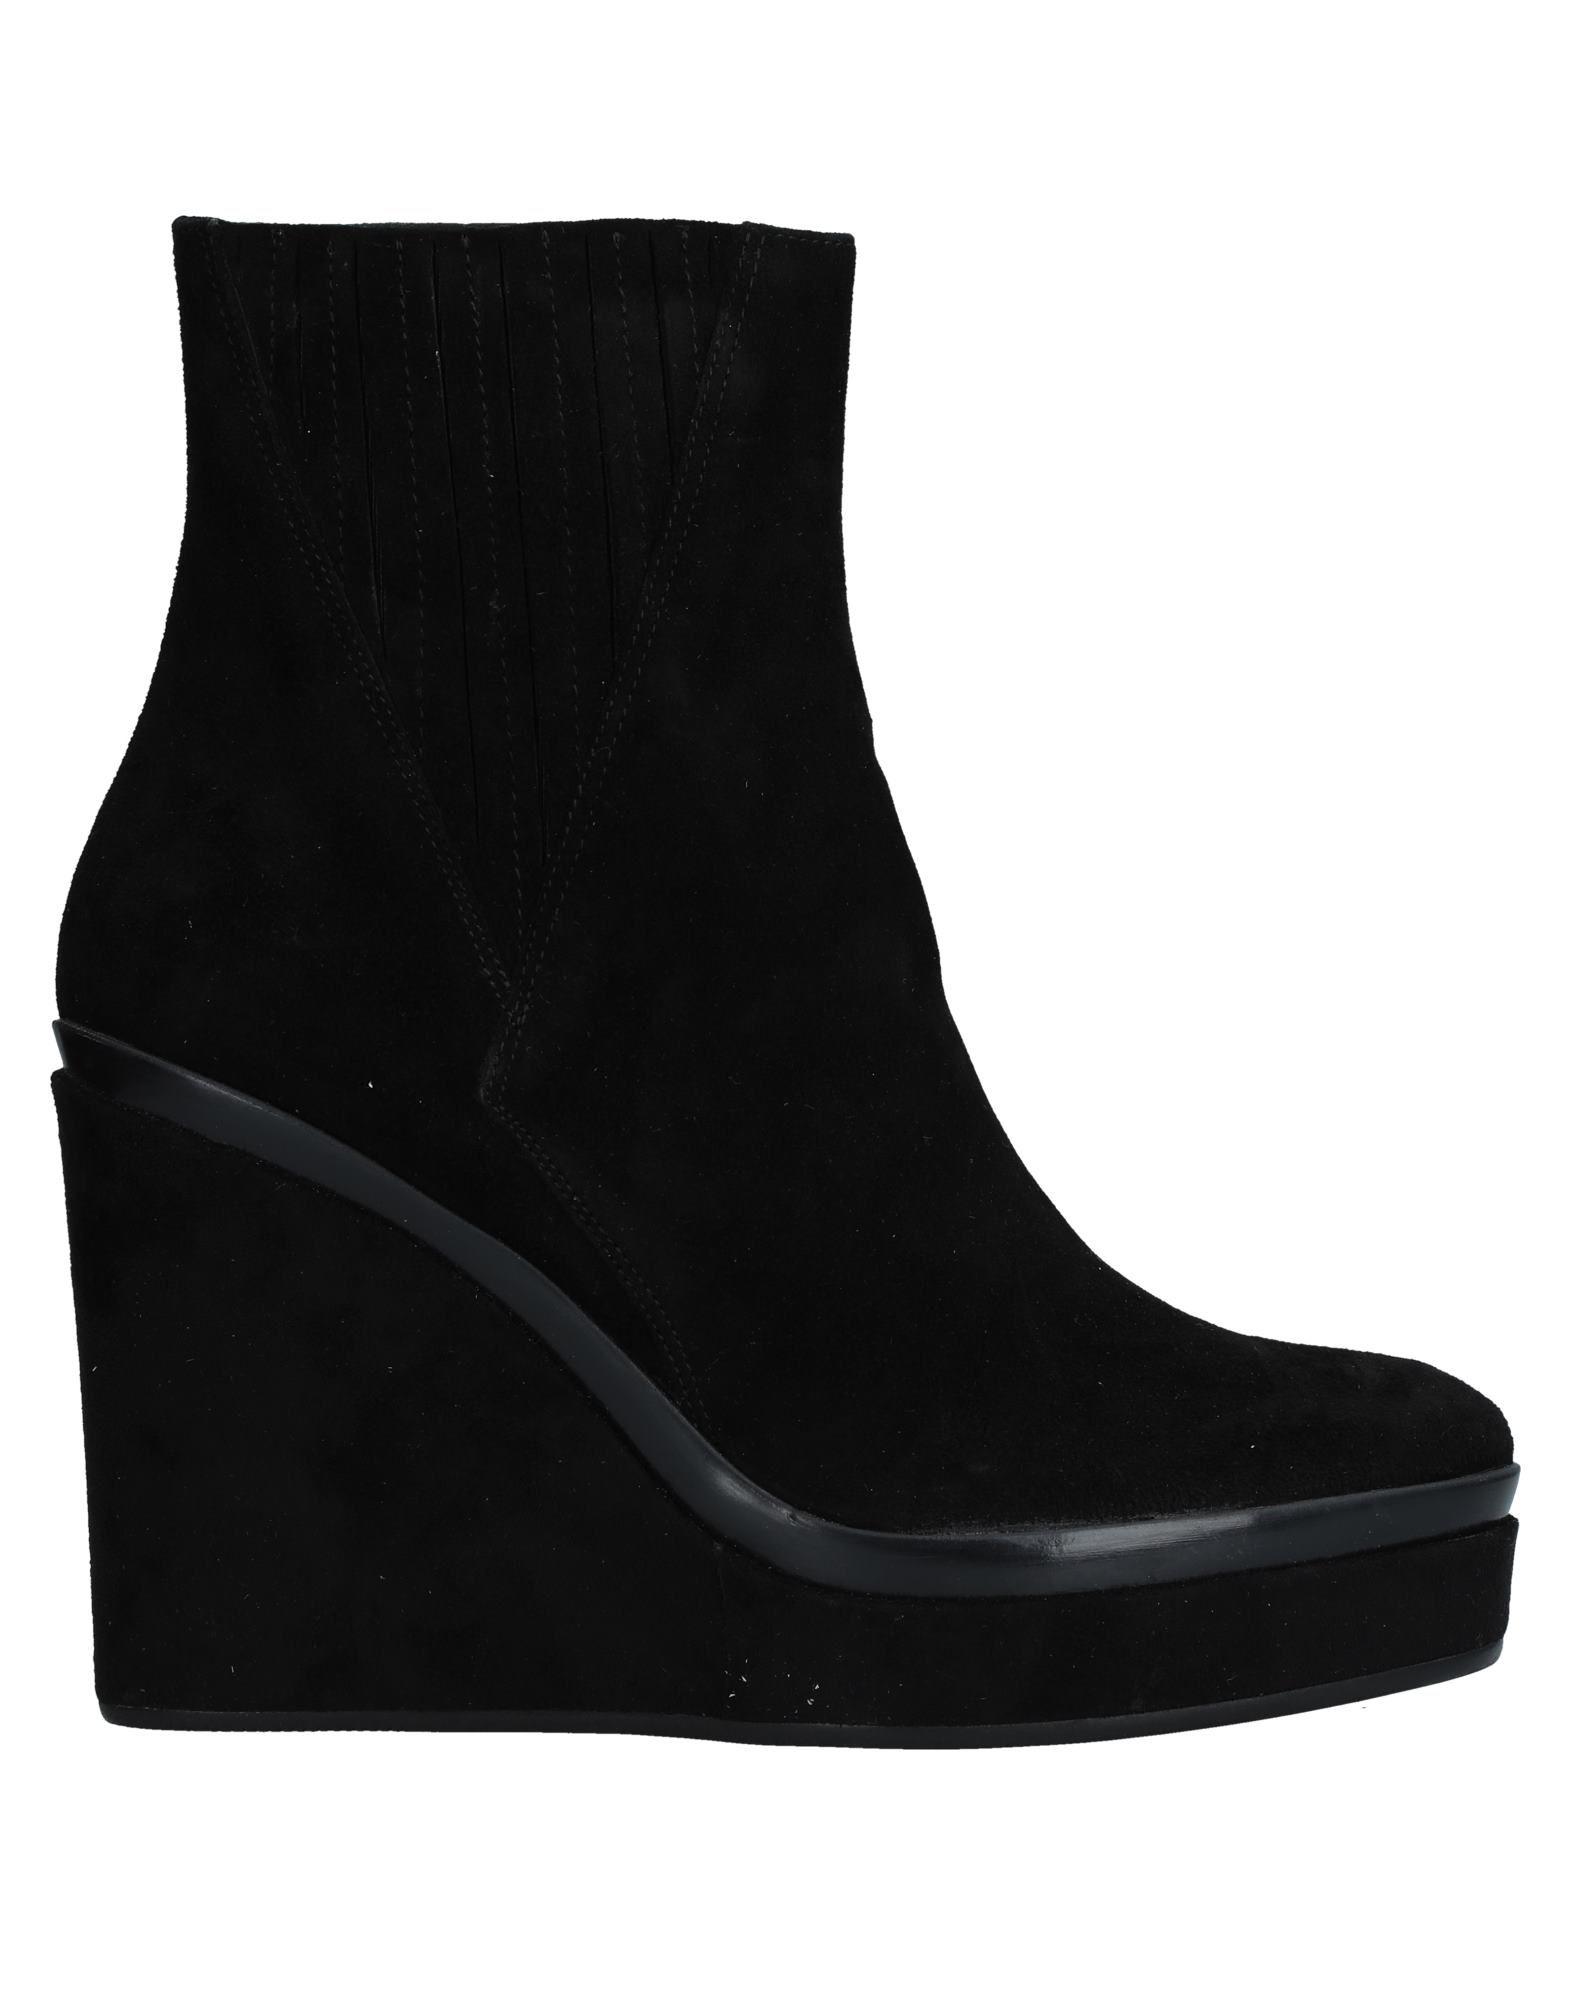 E...Vee Stiefelette Damen  11535501JG Gute Qualität beliebte Schuhe